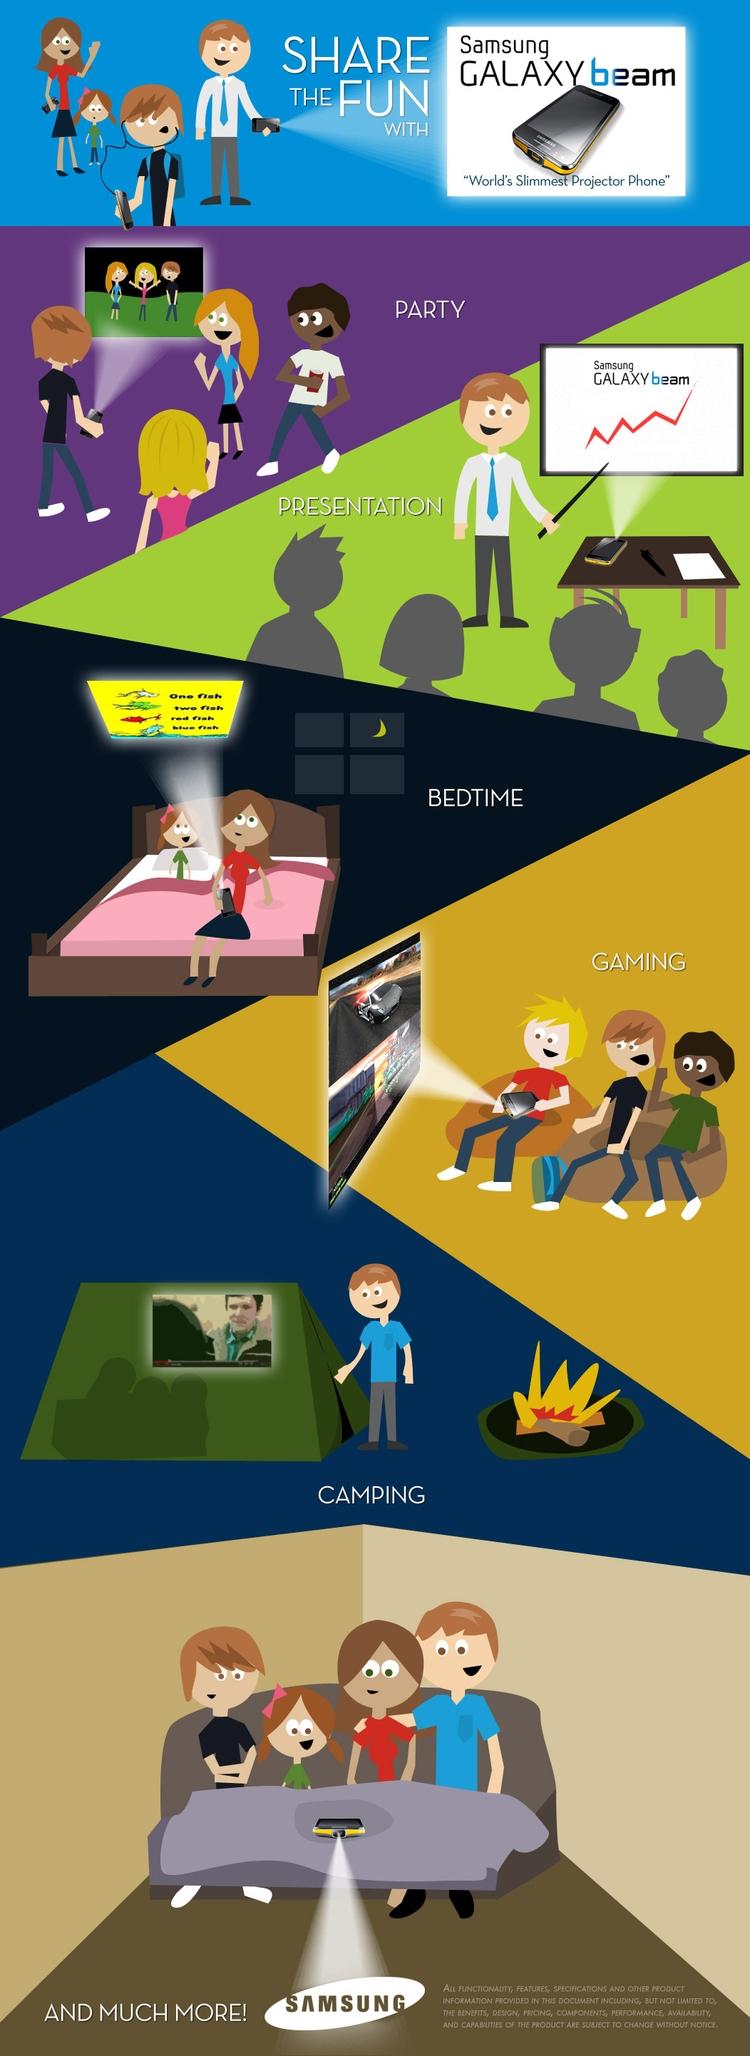 GALAXY Beam-infographic Videos - ellosamsung | ello